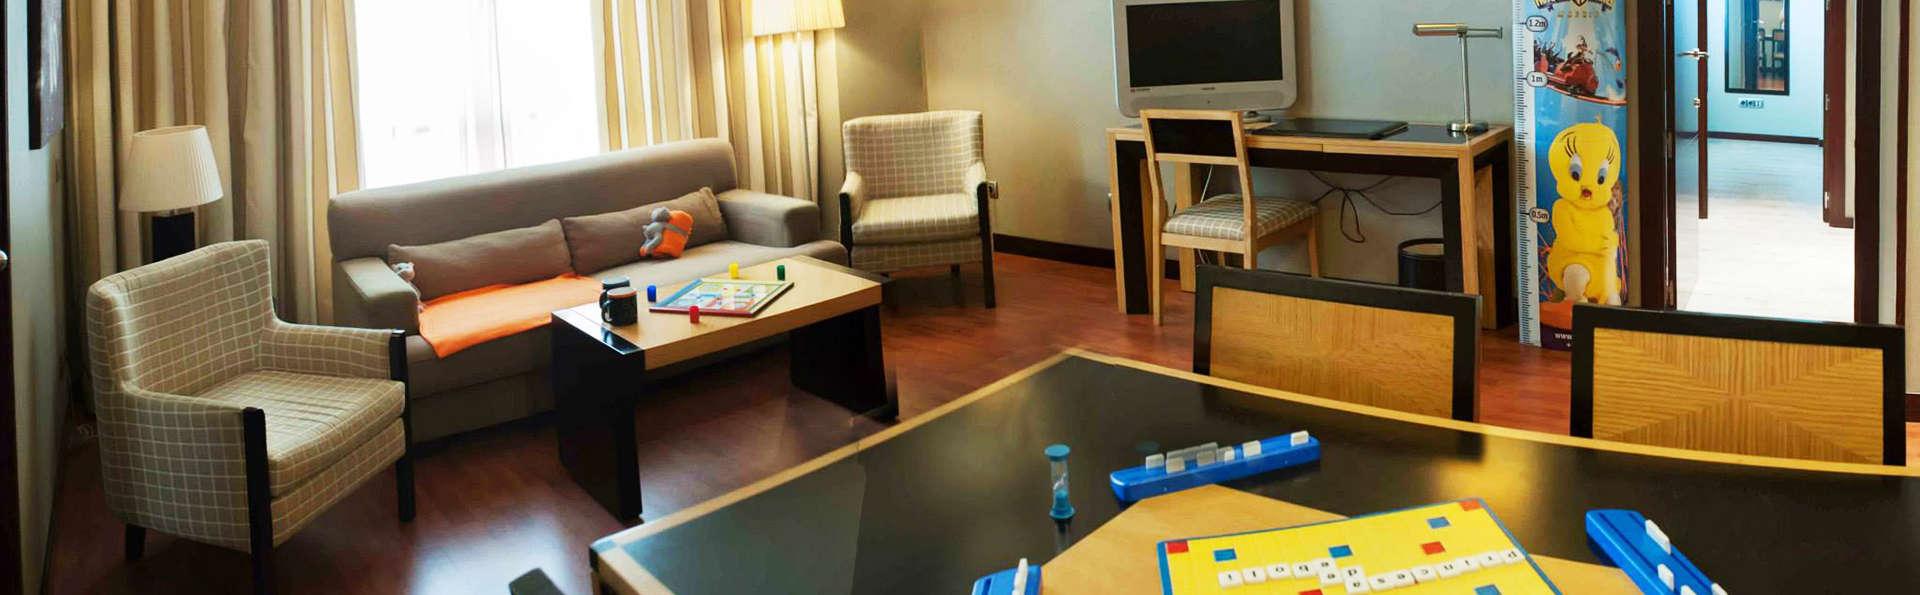 Hotel Sercotel Princesa de Éboli - EDIT_room3.jpg